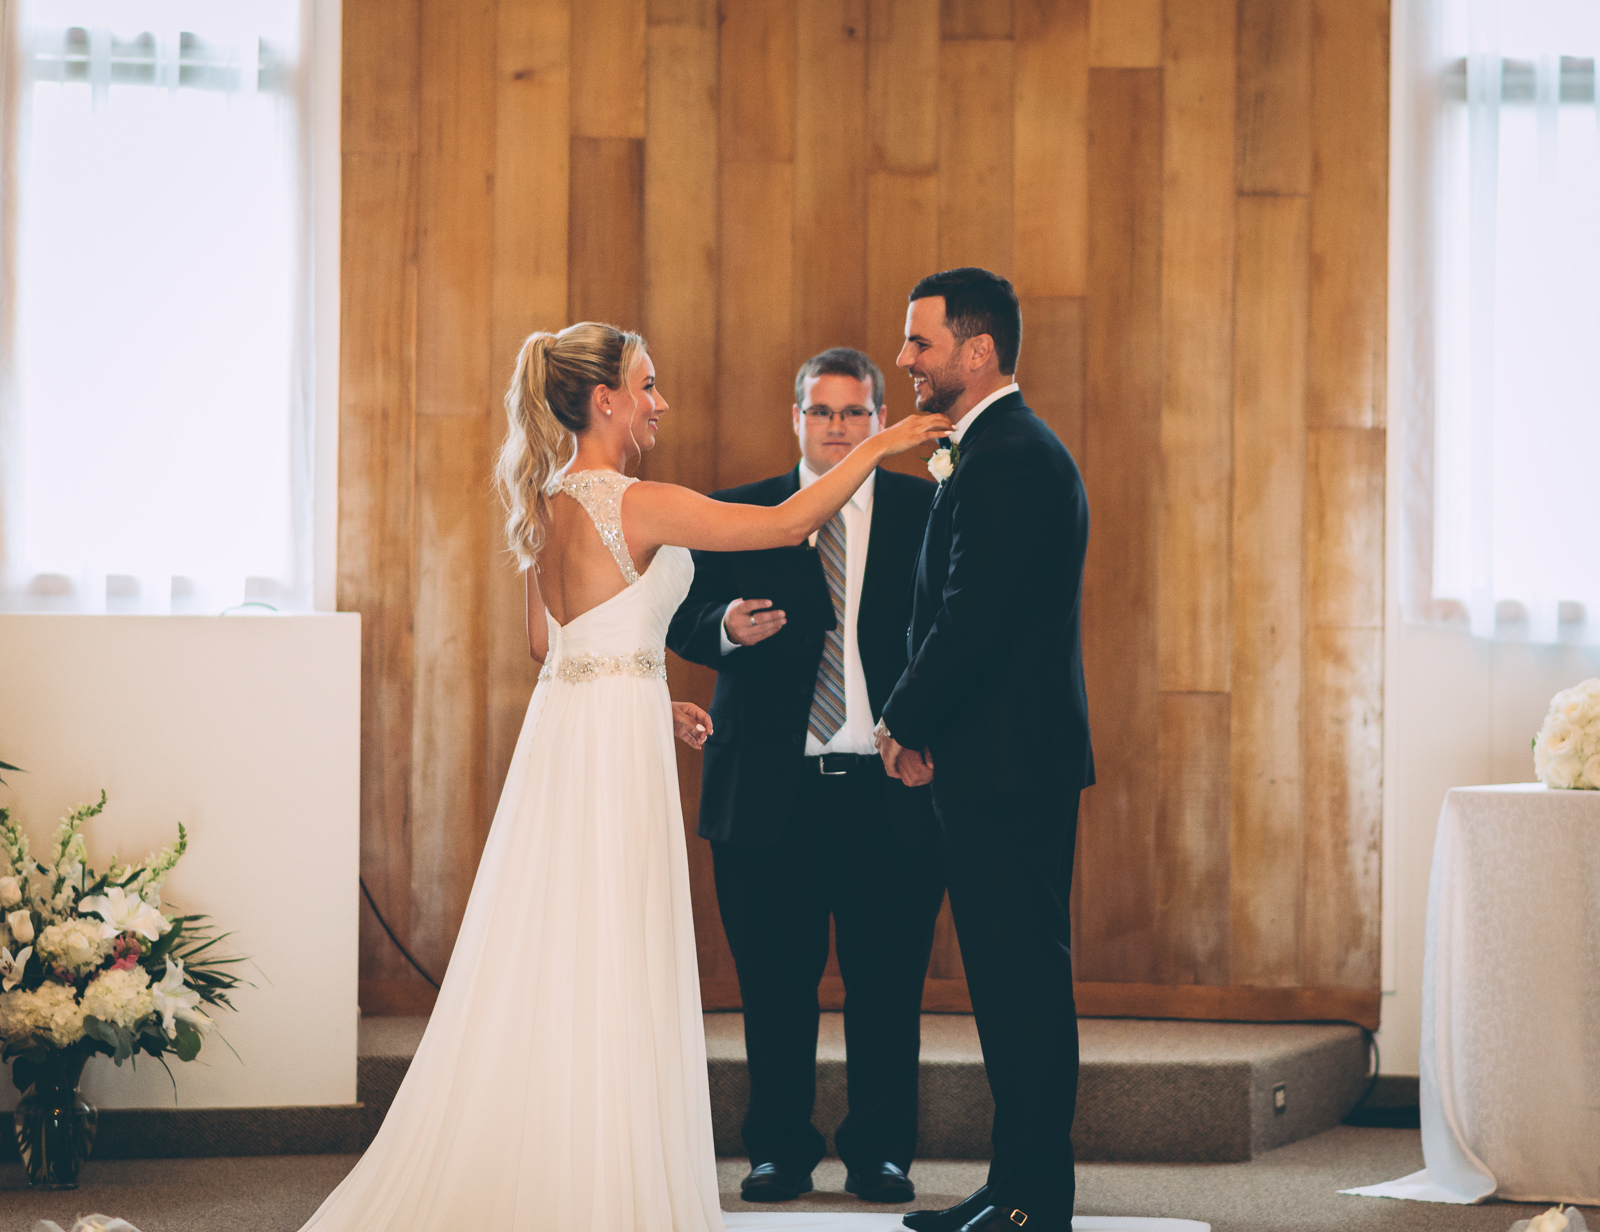 emily-jared-wedding-blog-28.jpg